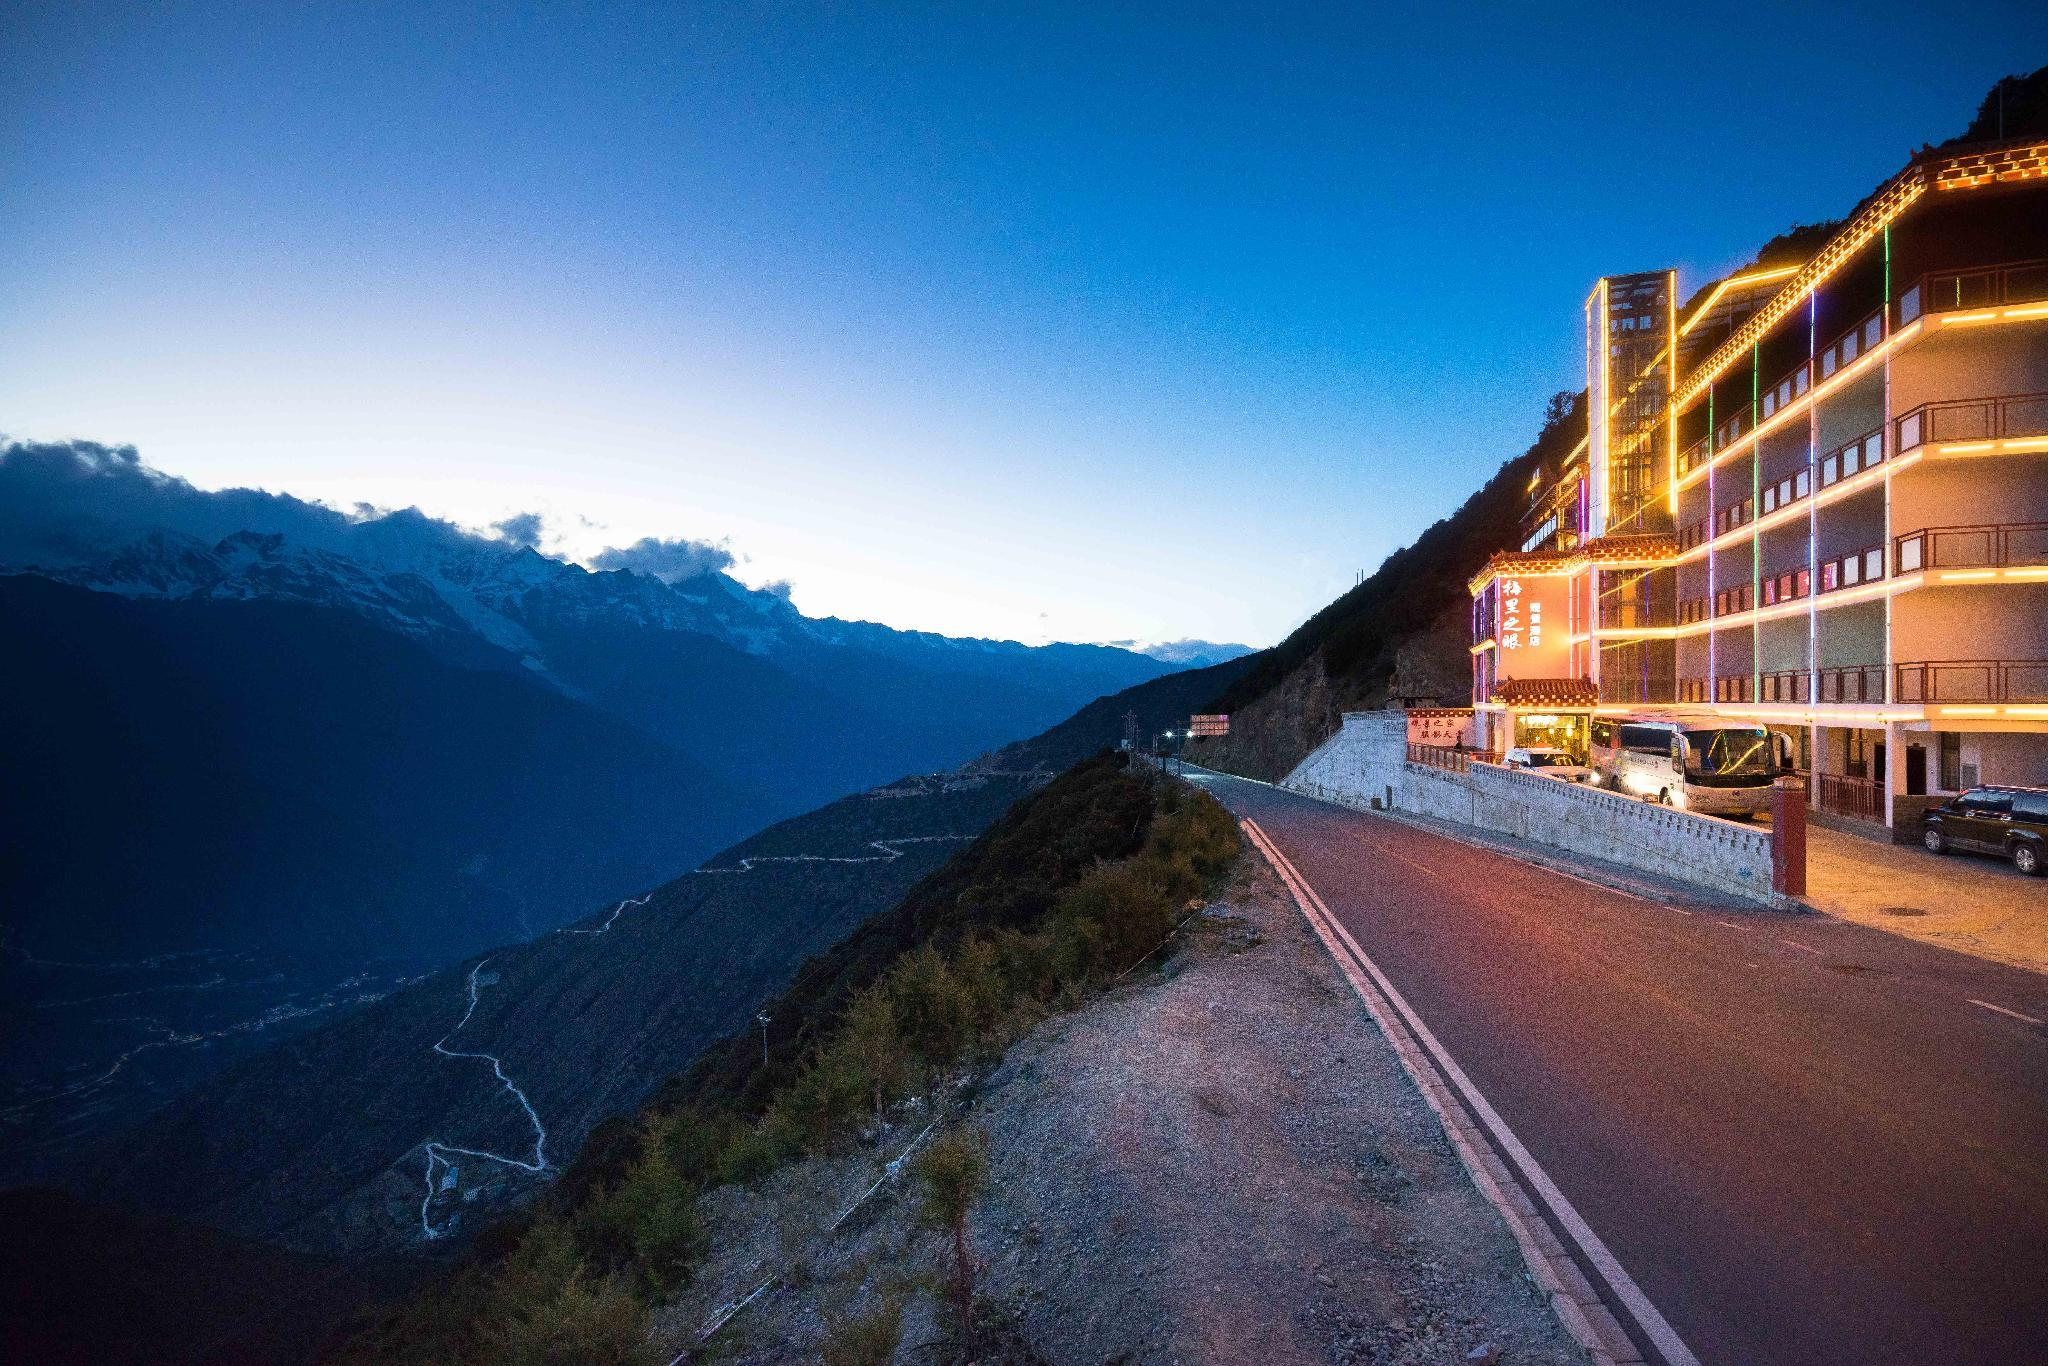 MEILIZHIYANKING, Dêqên Tibetan